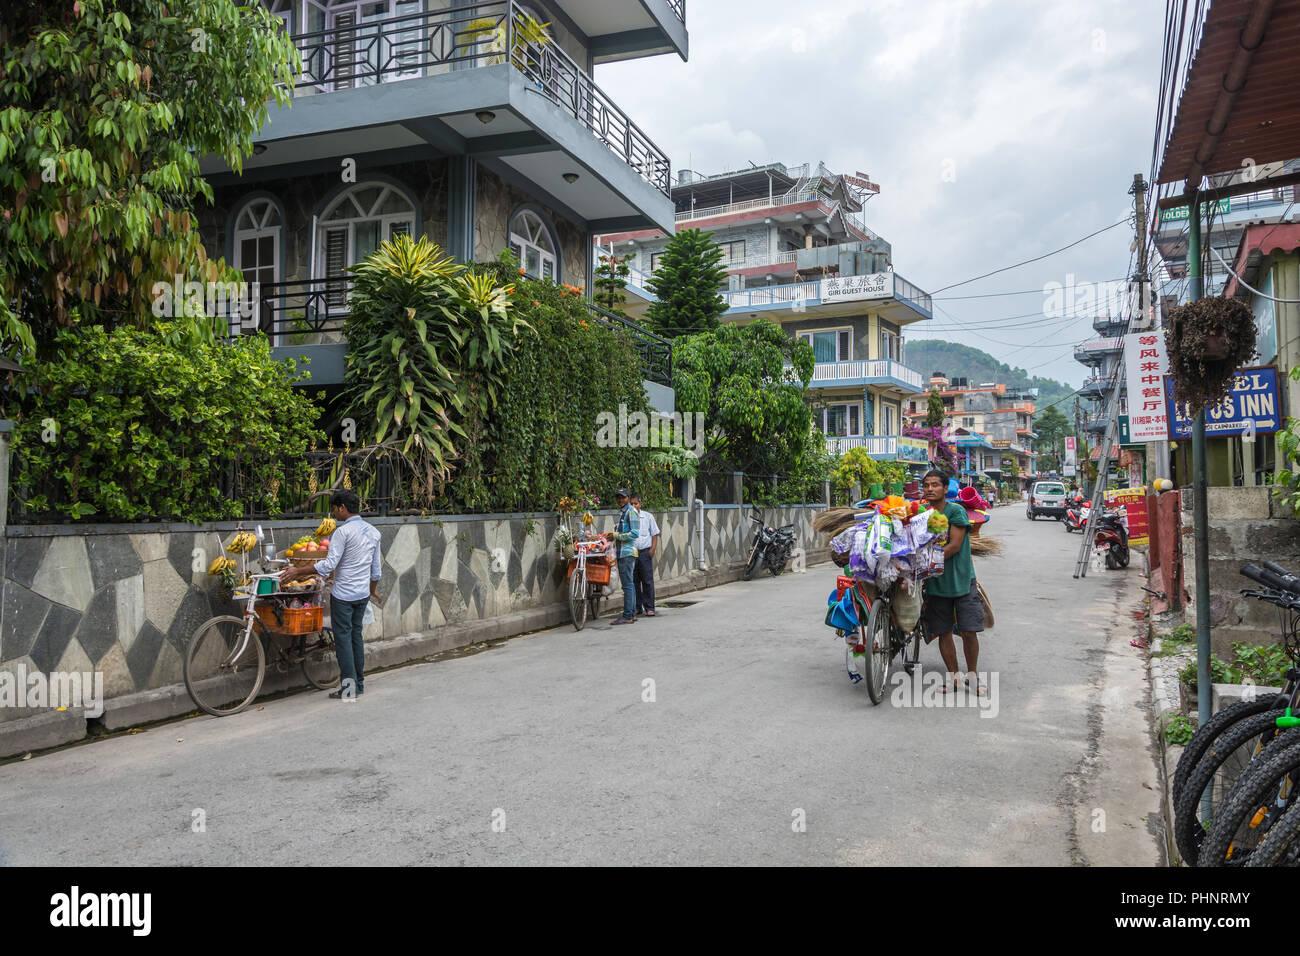 Pokhara, Nepal - 11.04.2018: Mobile Handel mit Fahrrädern 11 April 2018 Pokhara, Nepal. Stockbild